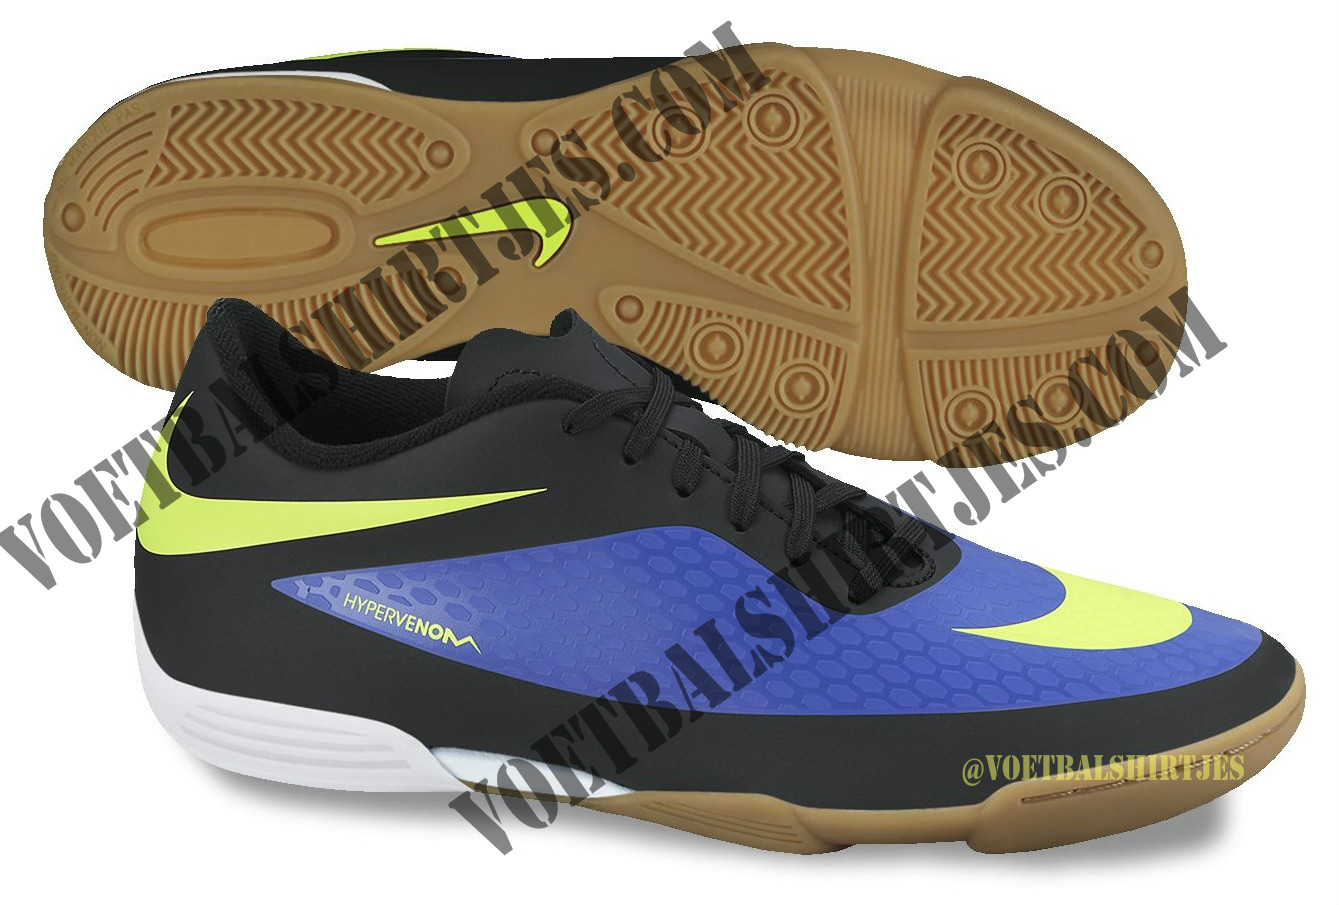 Nike Hypervenom 2014 Hyperblue / Volt / Black - Voetbalshirtjes.com